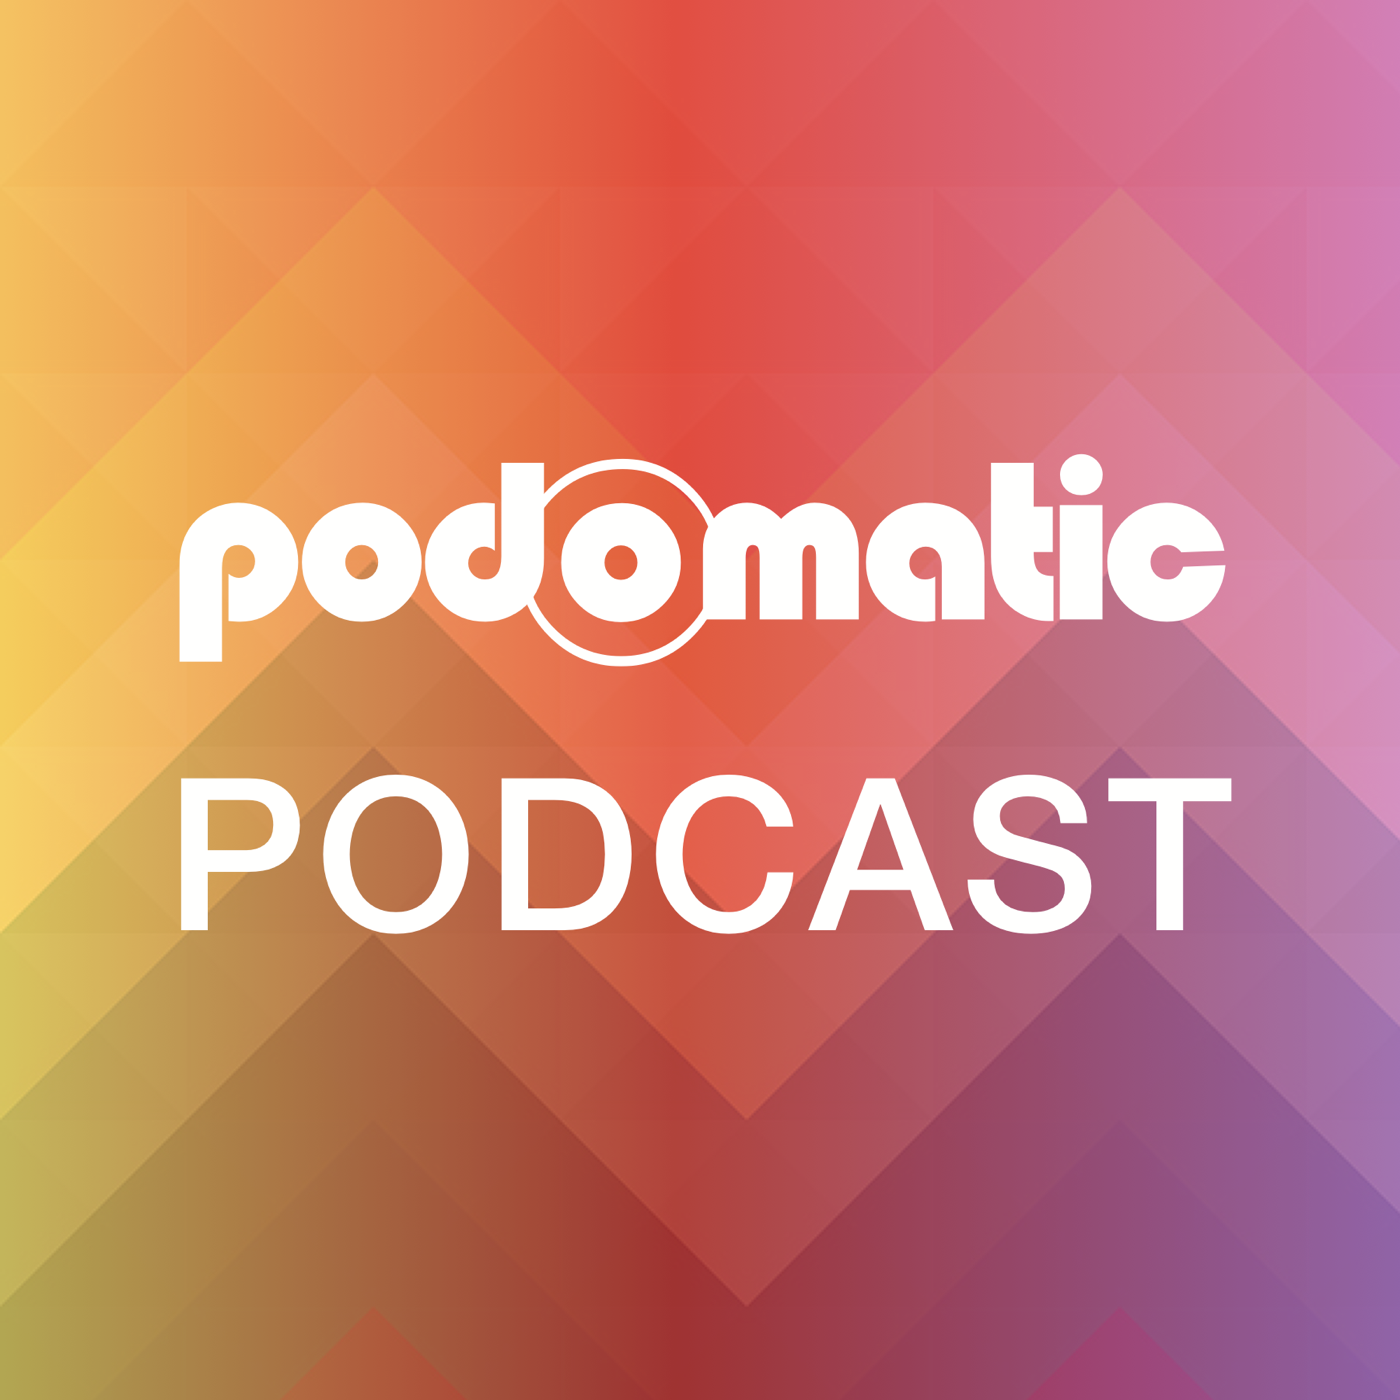 stopsnoring's Podcast